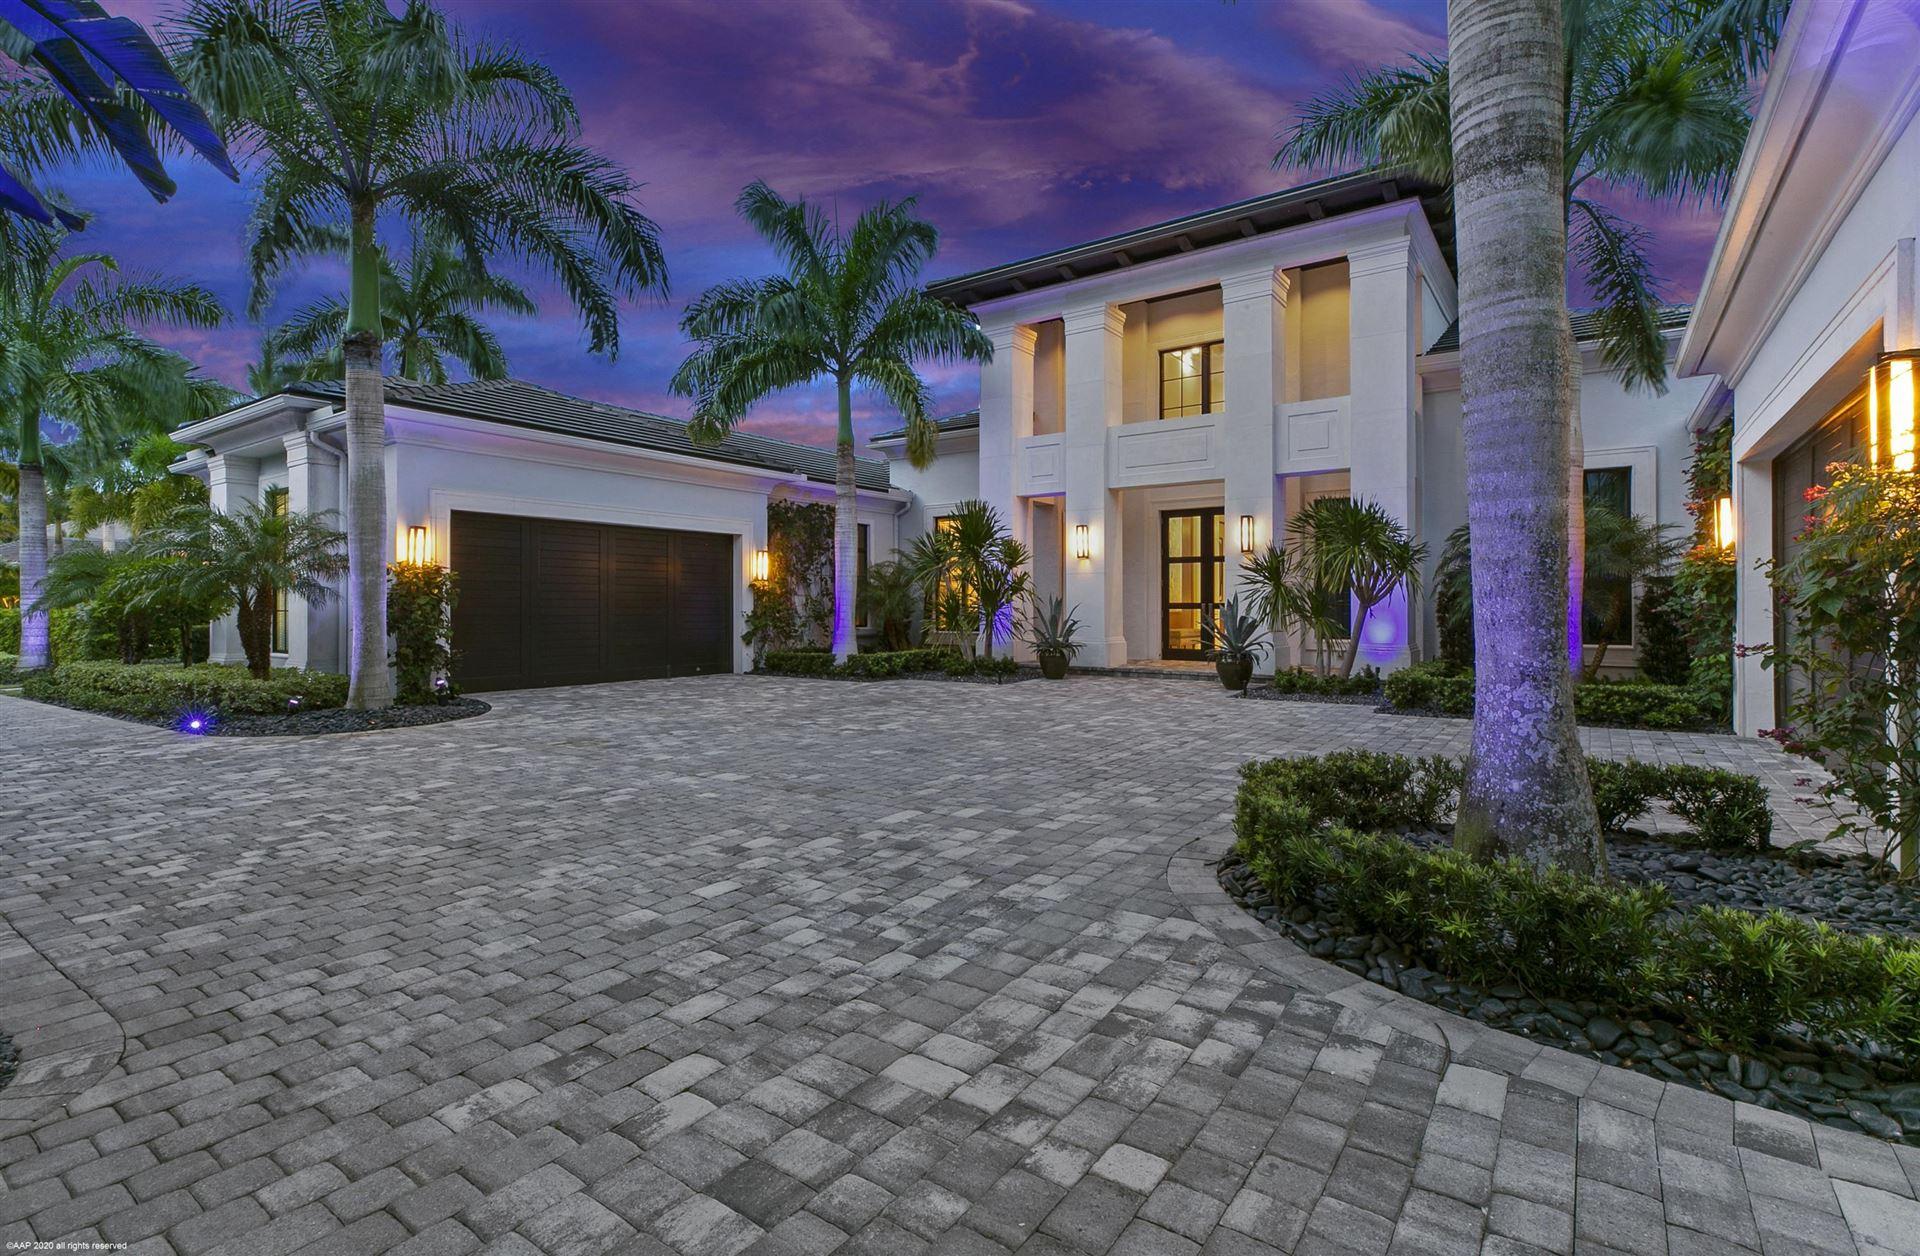 12034 Corozo Court, Palm Beach Gardens, FL 33418 - #: RX-10638946